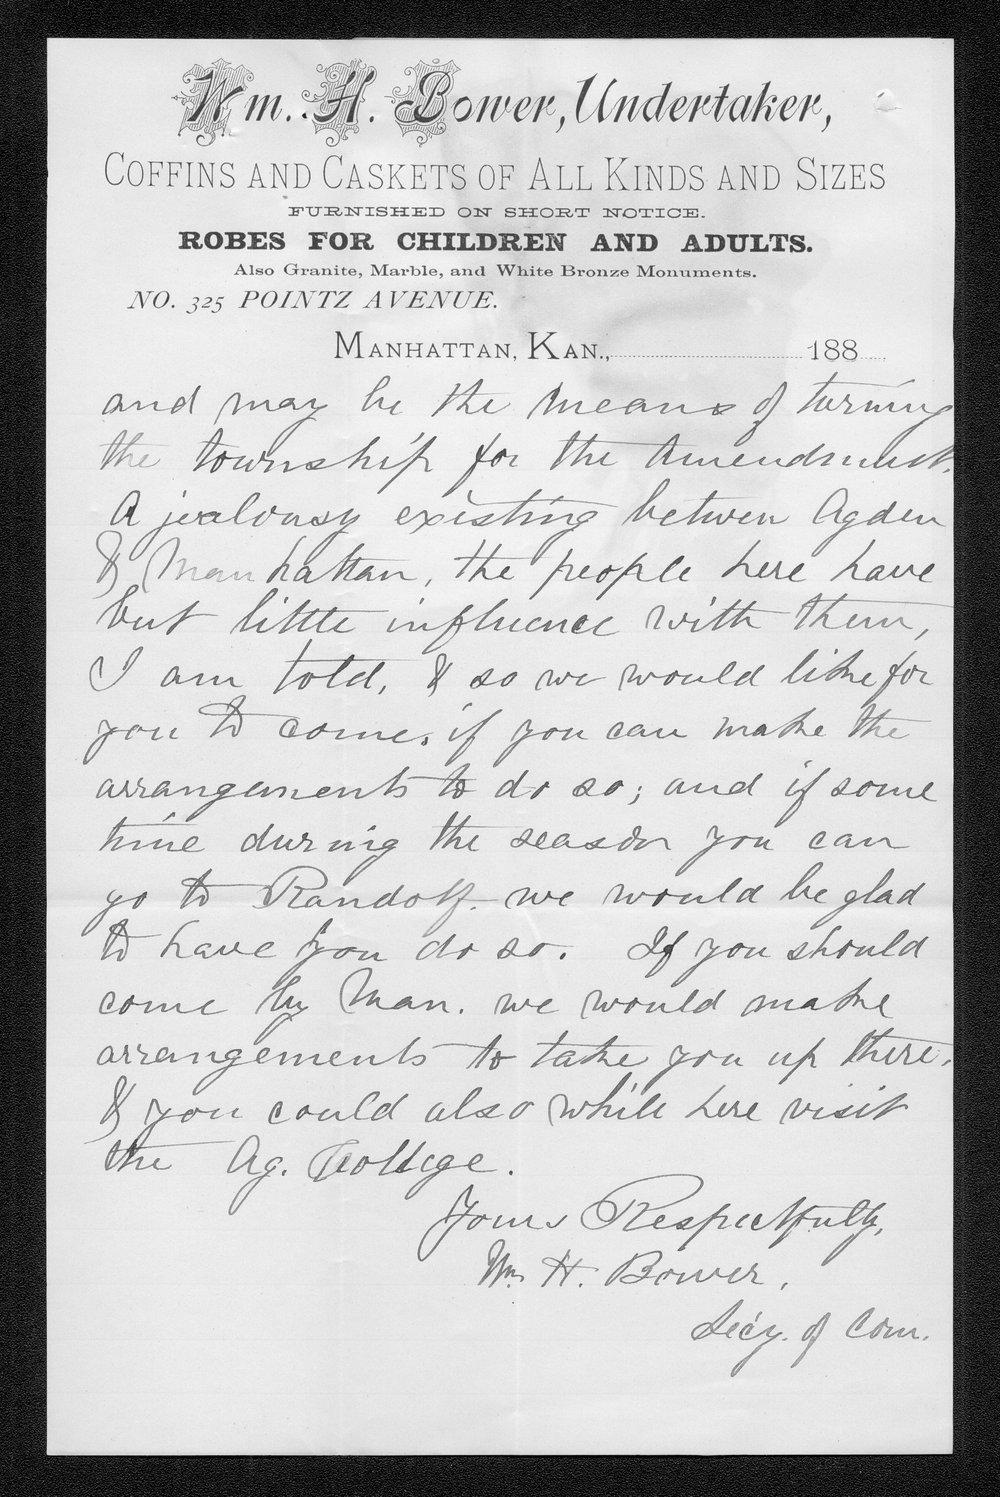 William H. Bower to Governor John St. John - 2